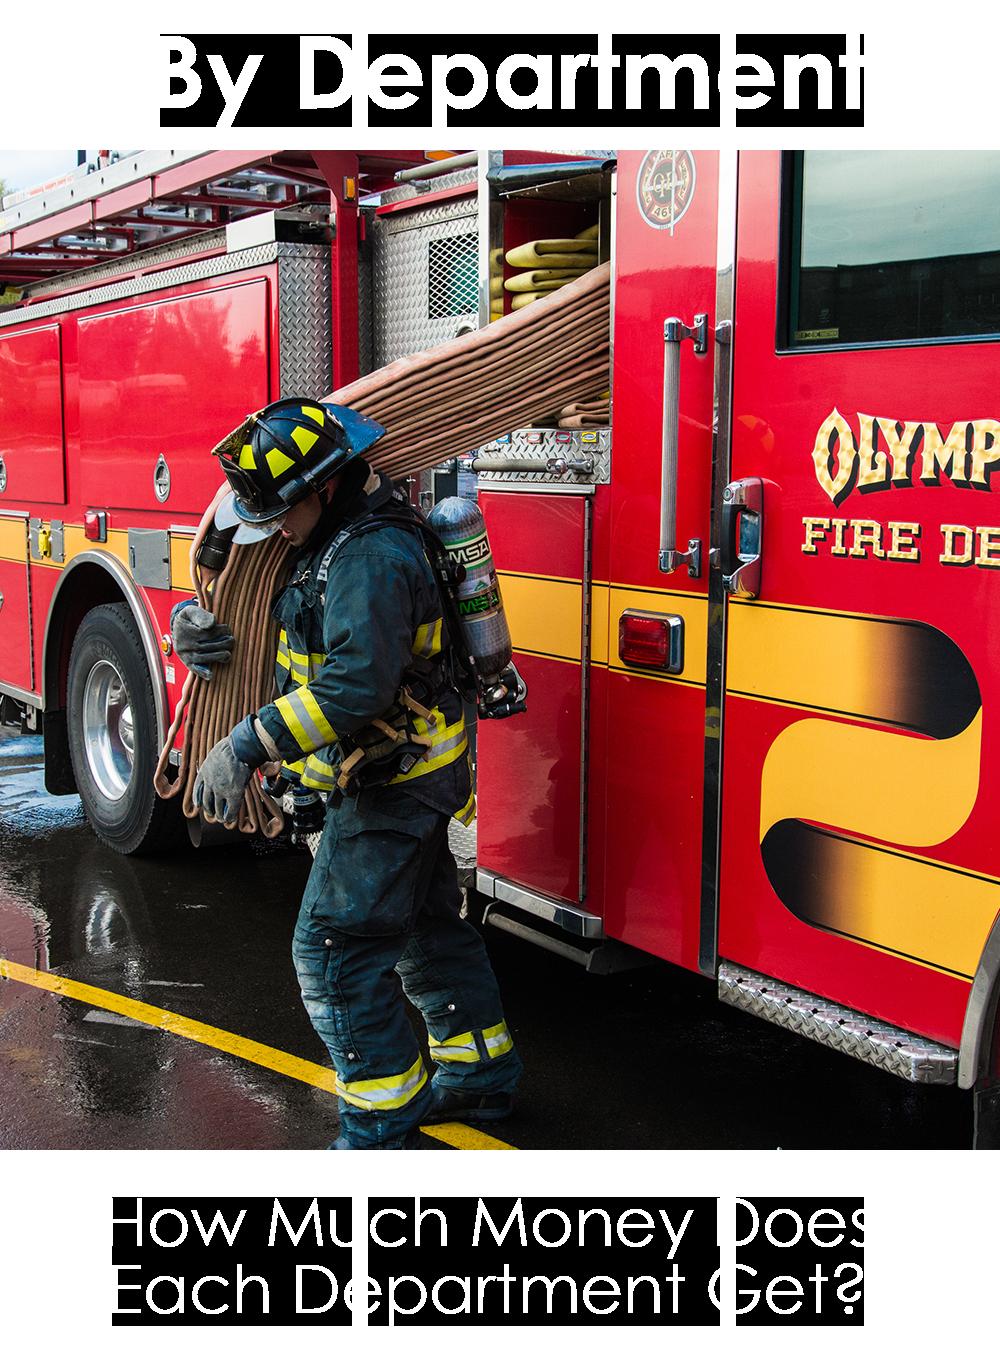 Firefighter pulling hose off truck